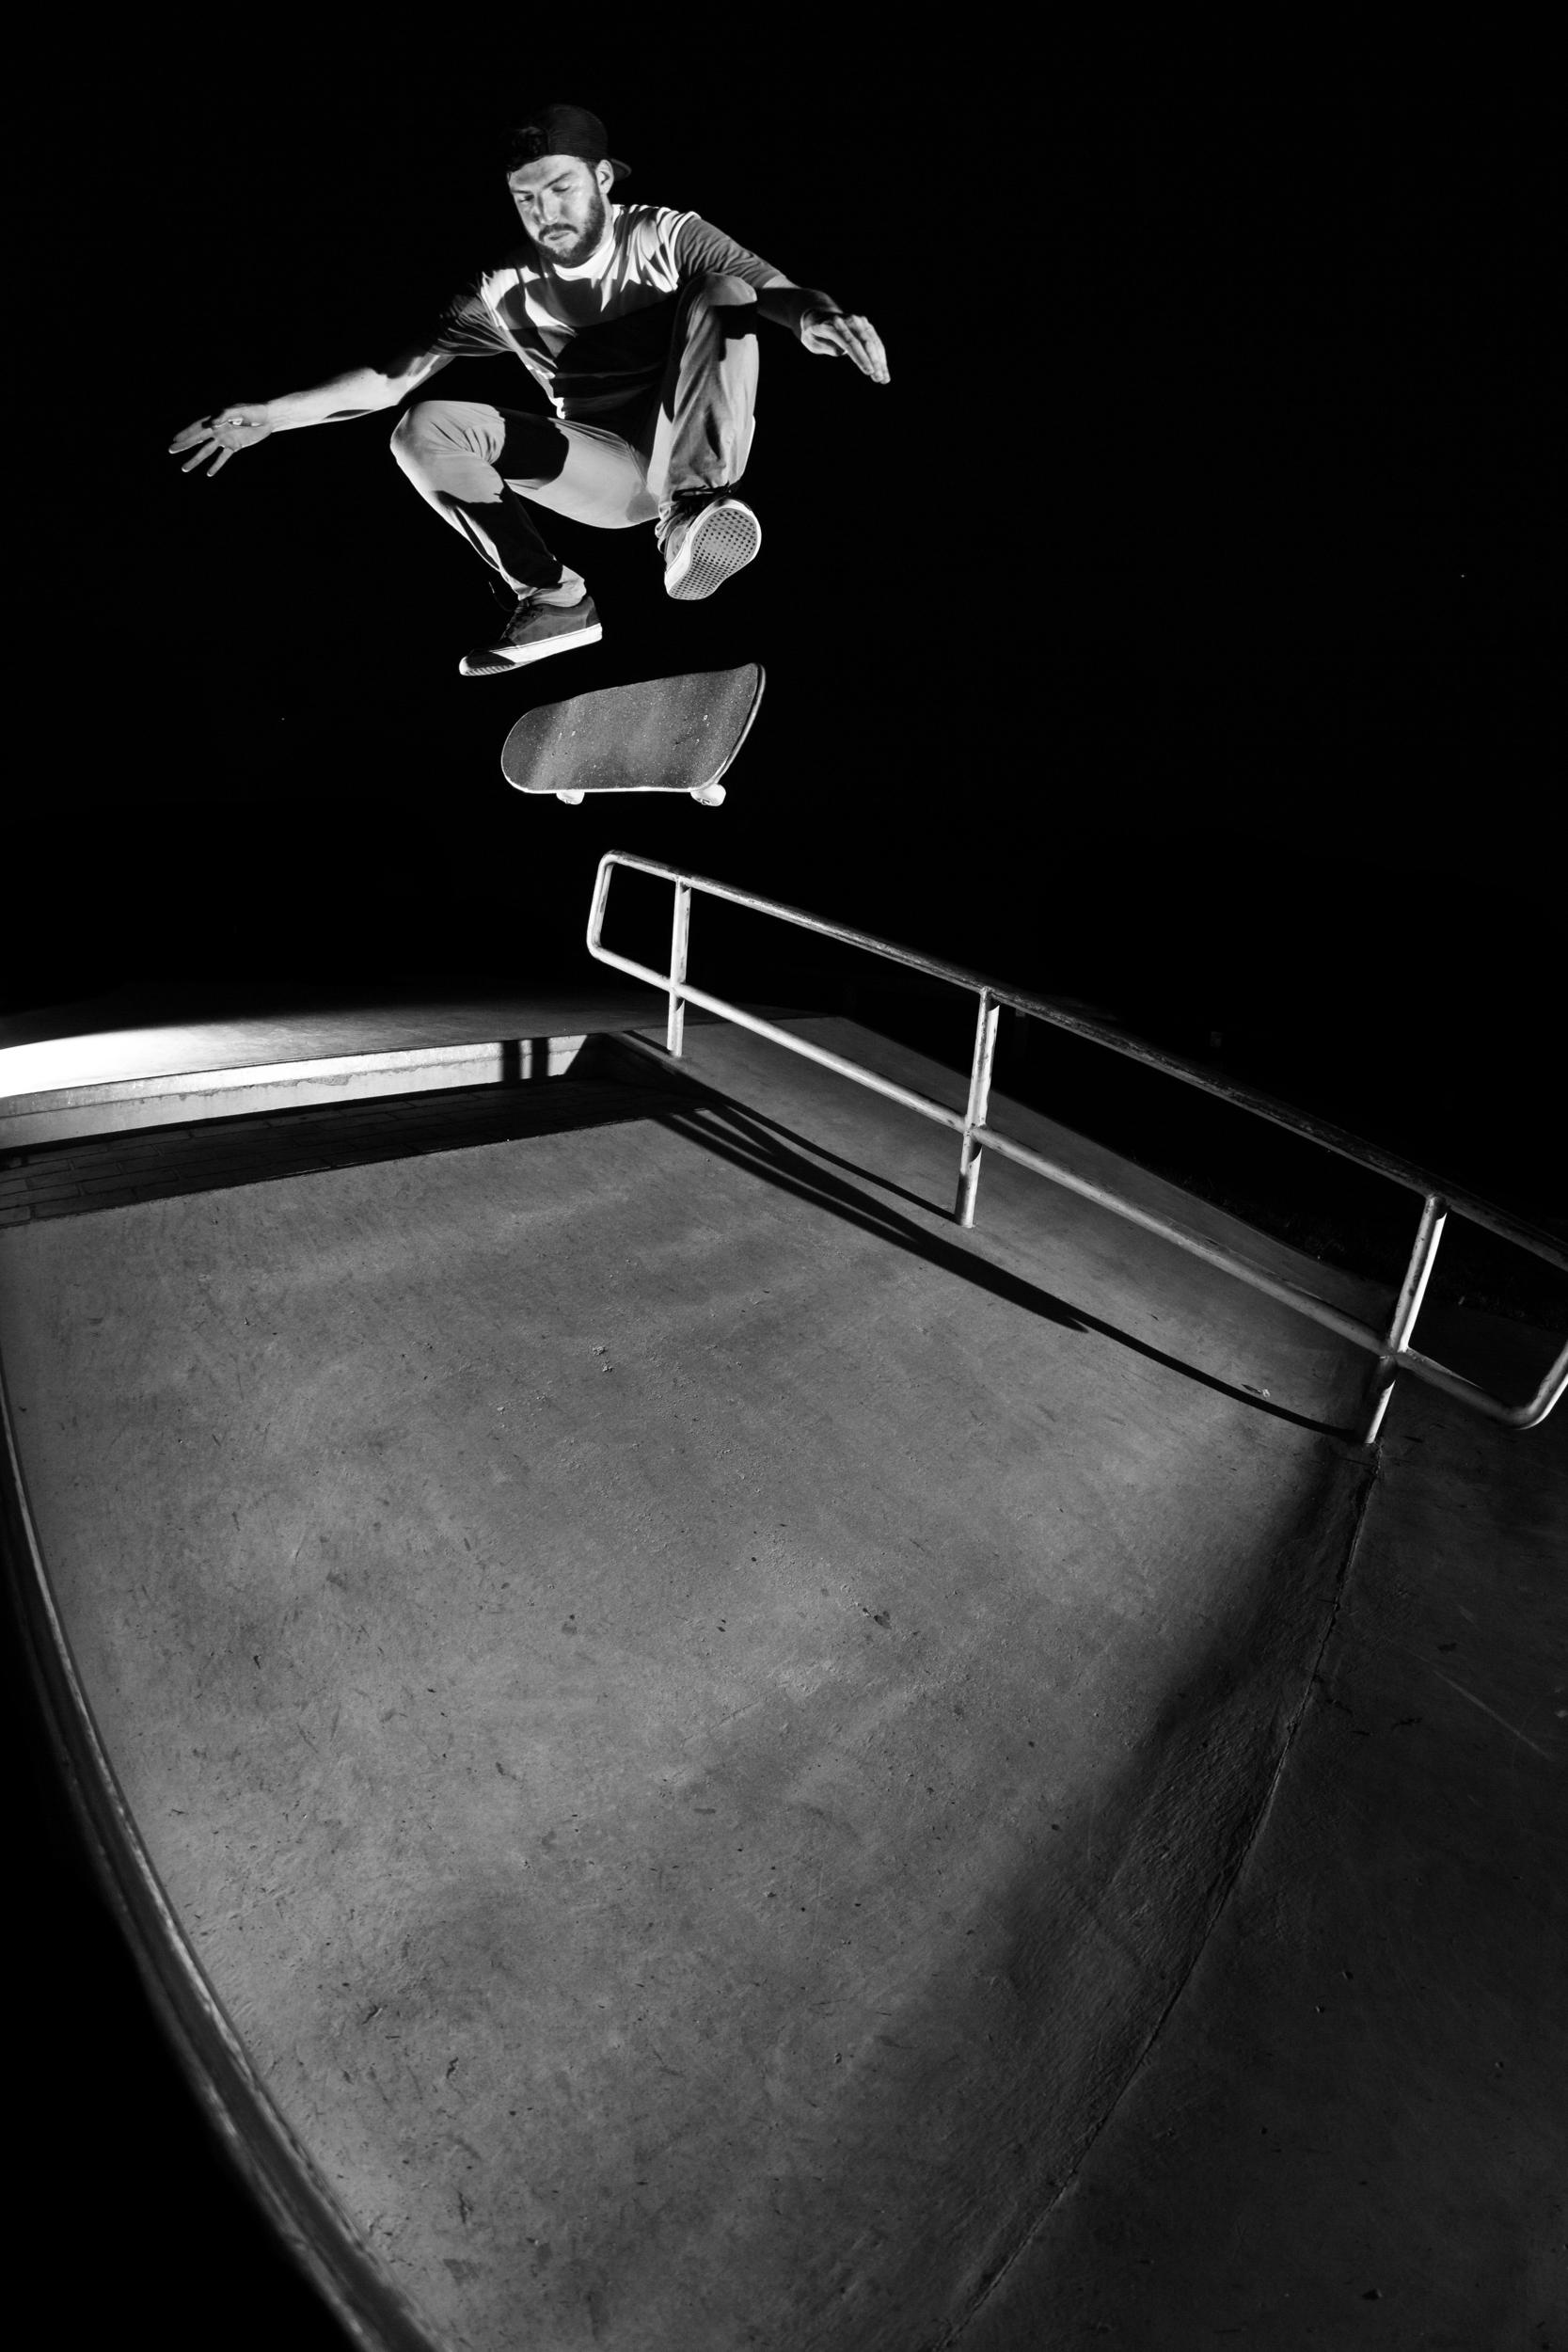 Ryan Dow - Kickflip